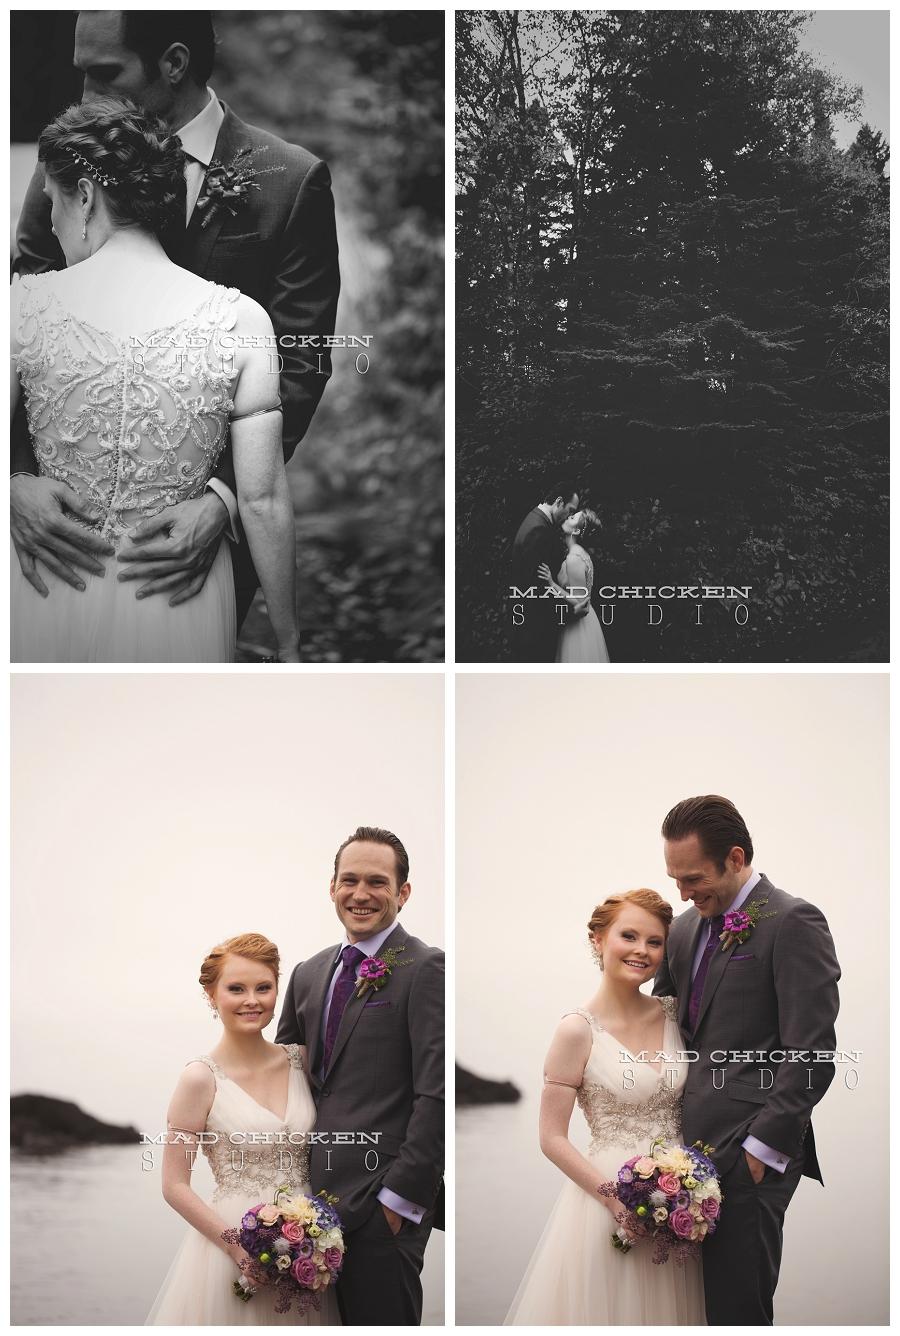 16 duluth wedding photographer mad chicken studio in lutsen mn for wedding photography.jpg